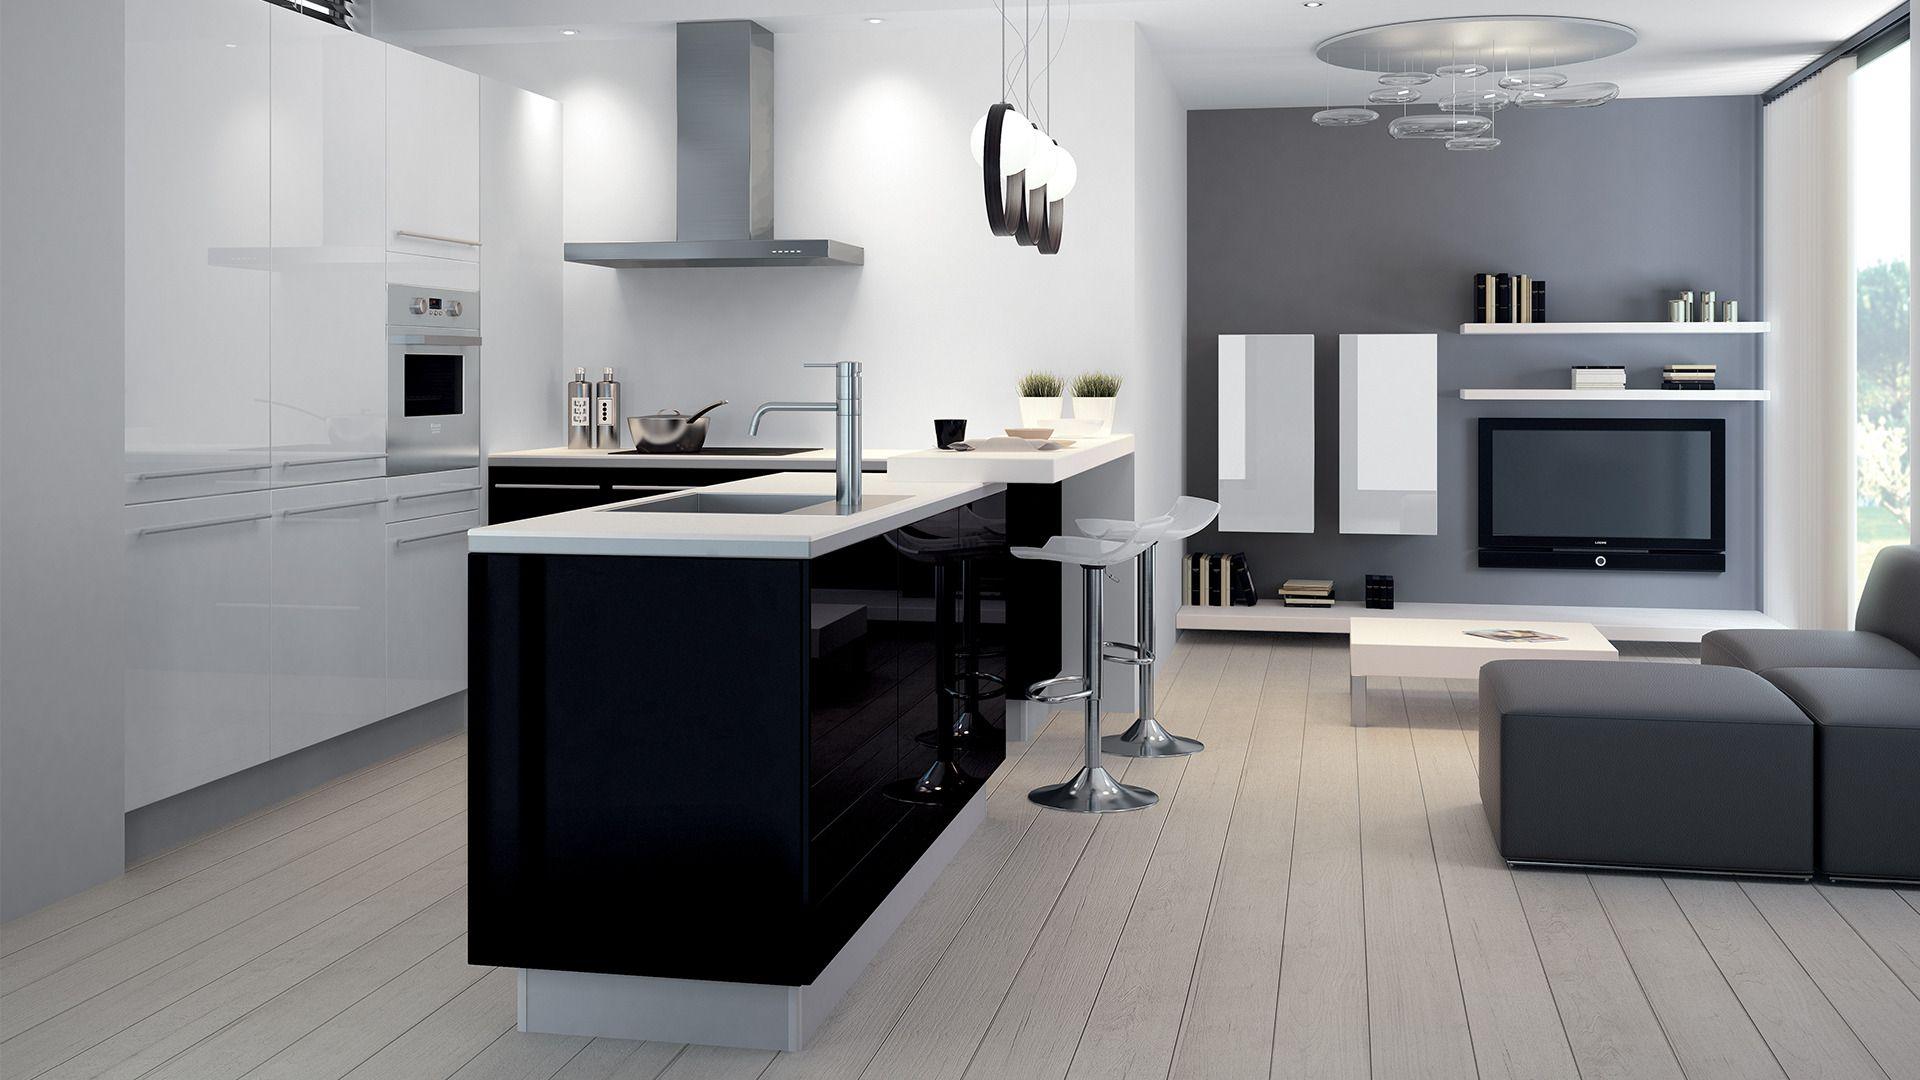 Deco Van Kesyme Op Home Interieur Keuken